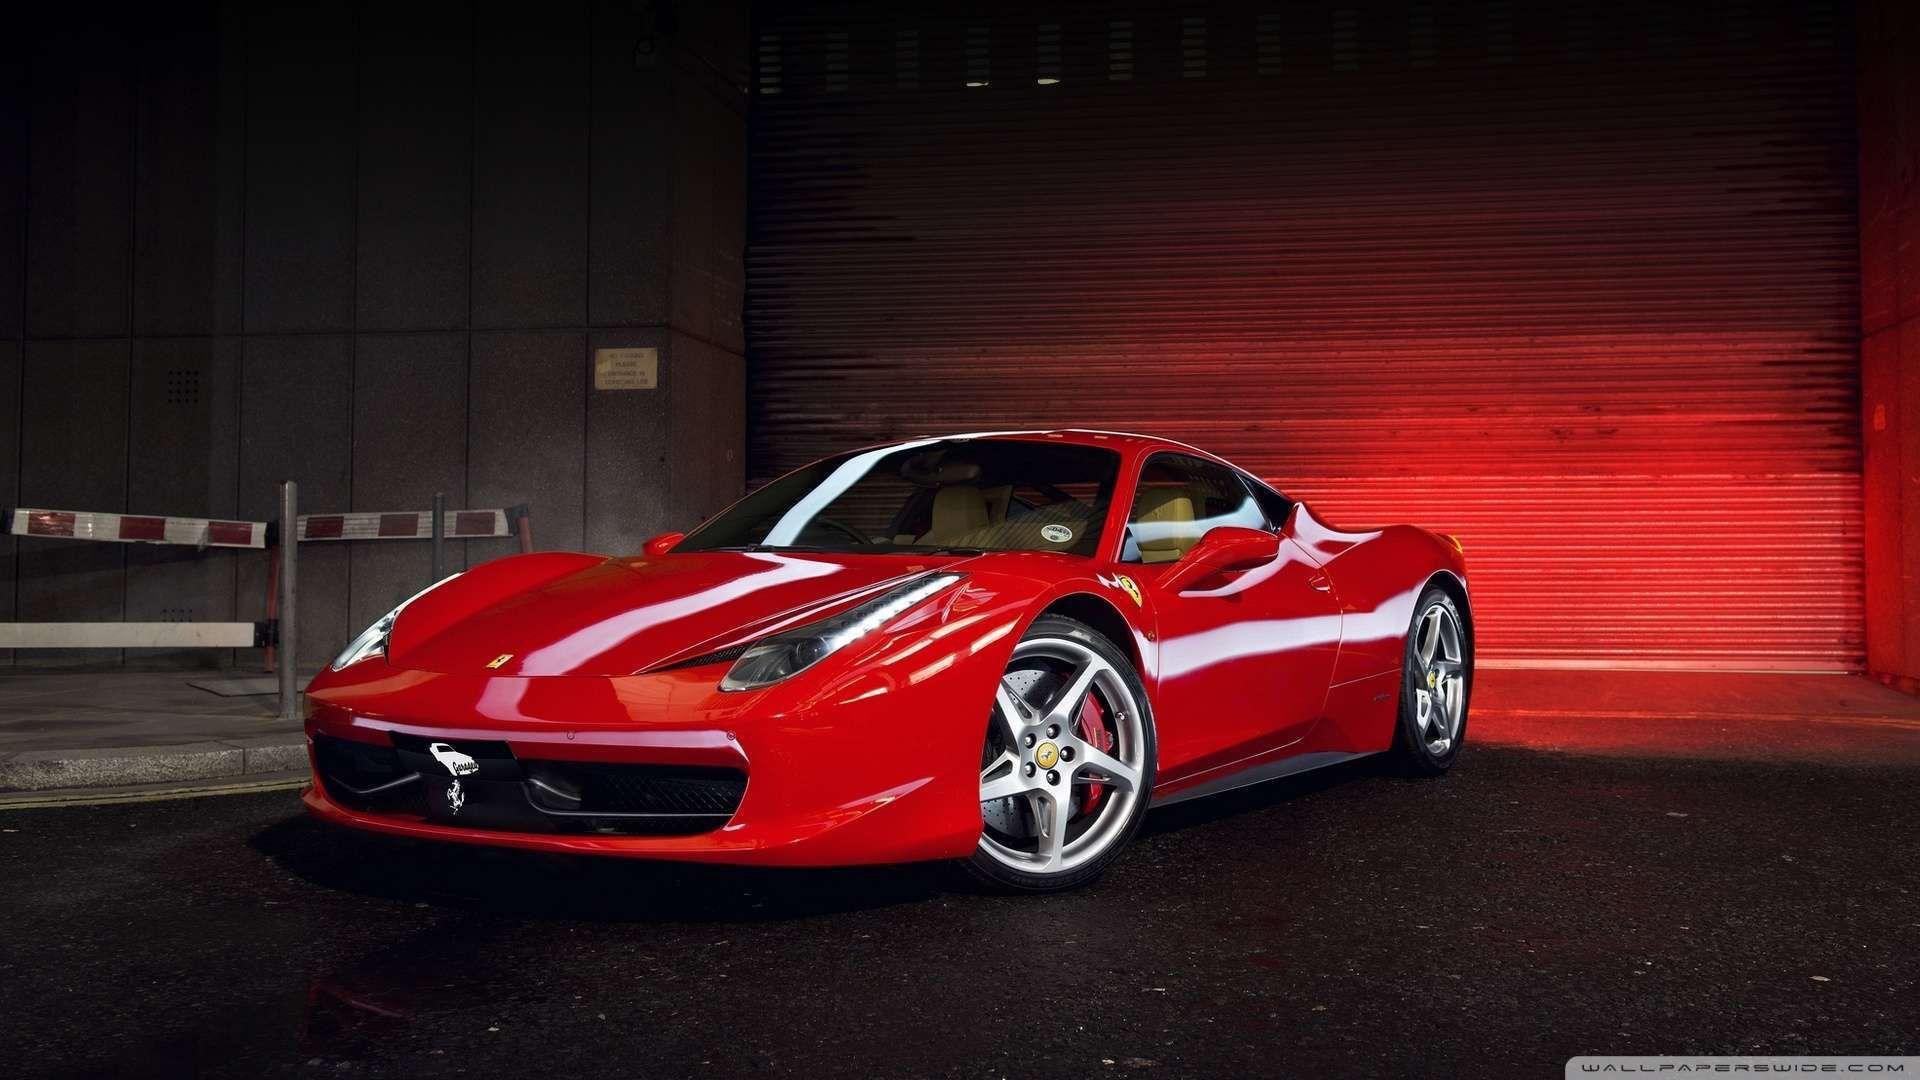 Ferrari 1080p Wallpaper Dengan Gambar